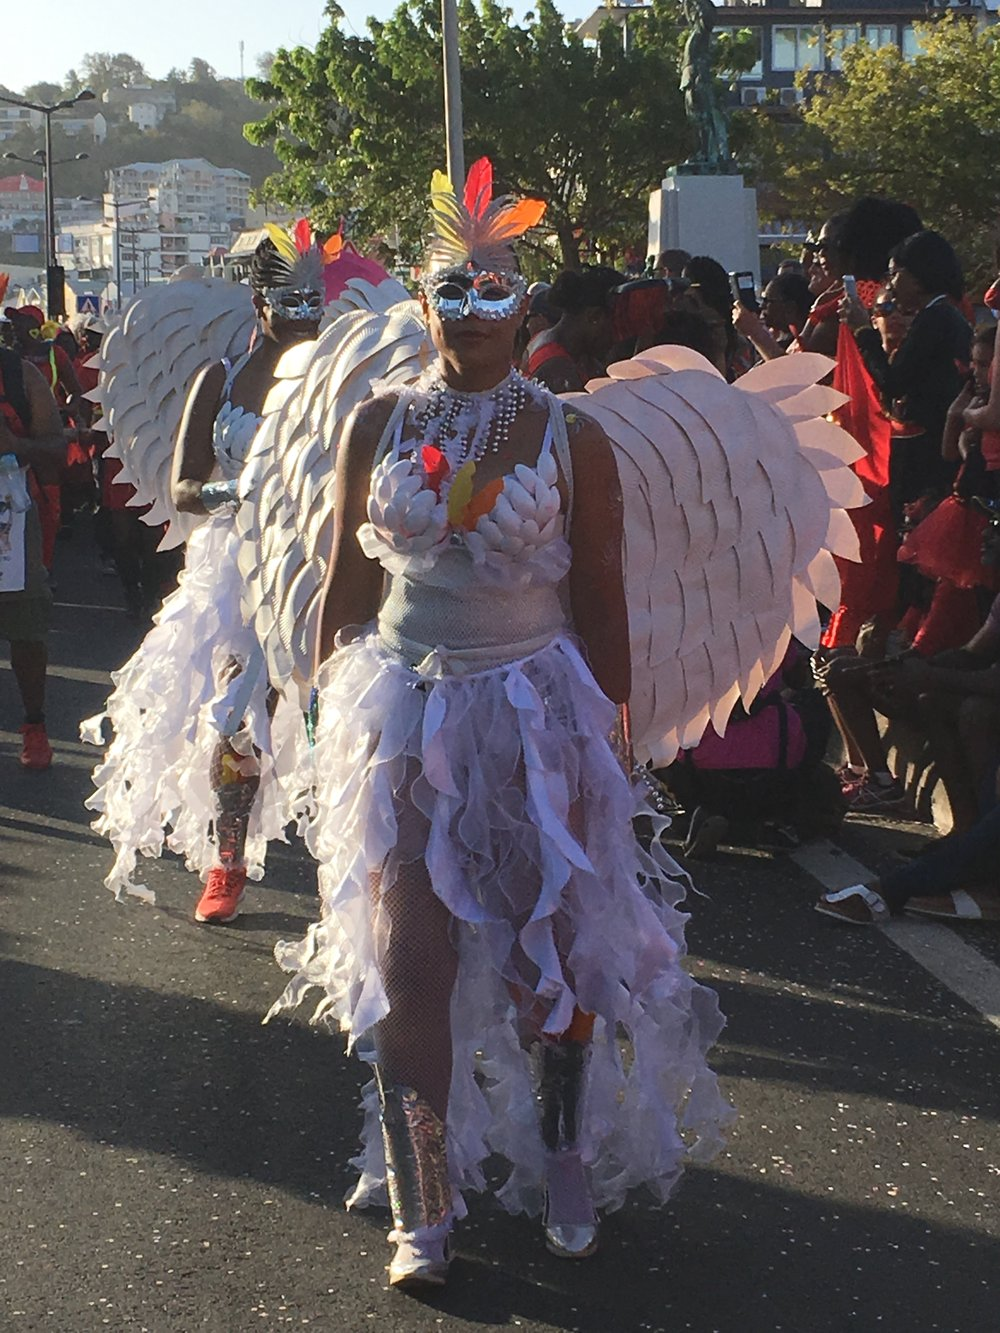 martinique-carnaval-angel.jpg